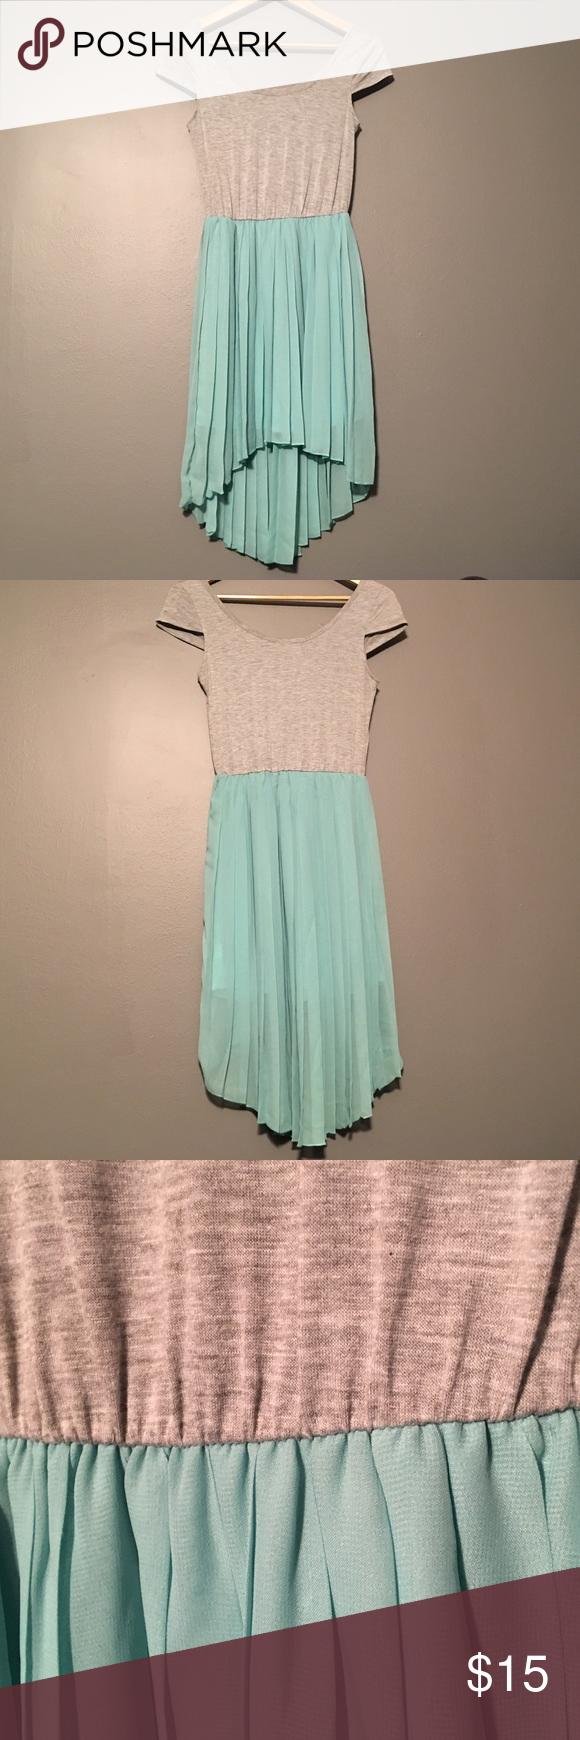 Charlotte Russe Hi-Low dress in mint/grey Hi-Low dress in mint/gray Charlotte Russe Dresses High Low